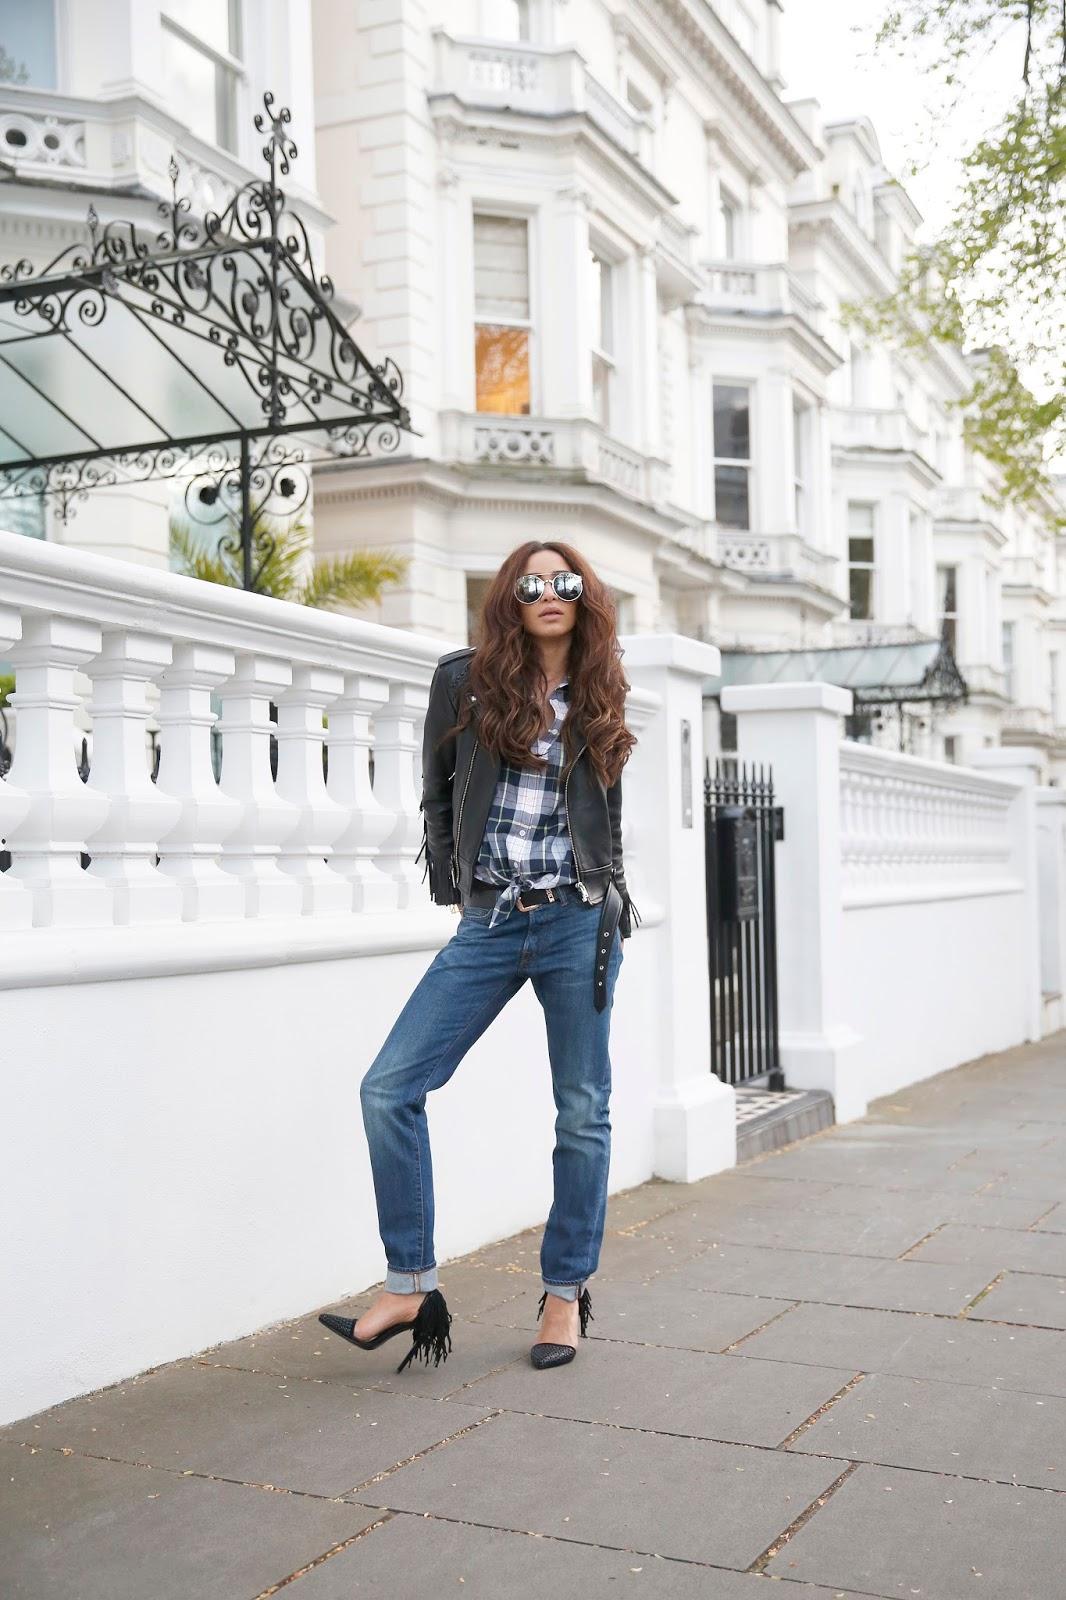 Victoria Metaxas - London fashion photographer and blogger